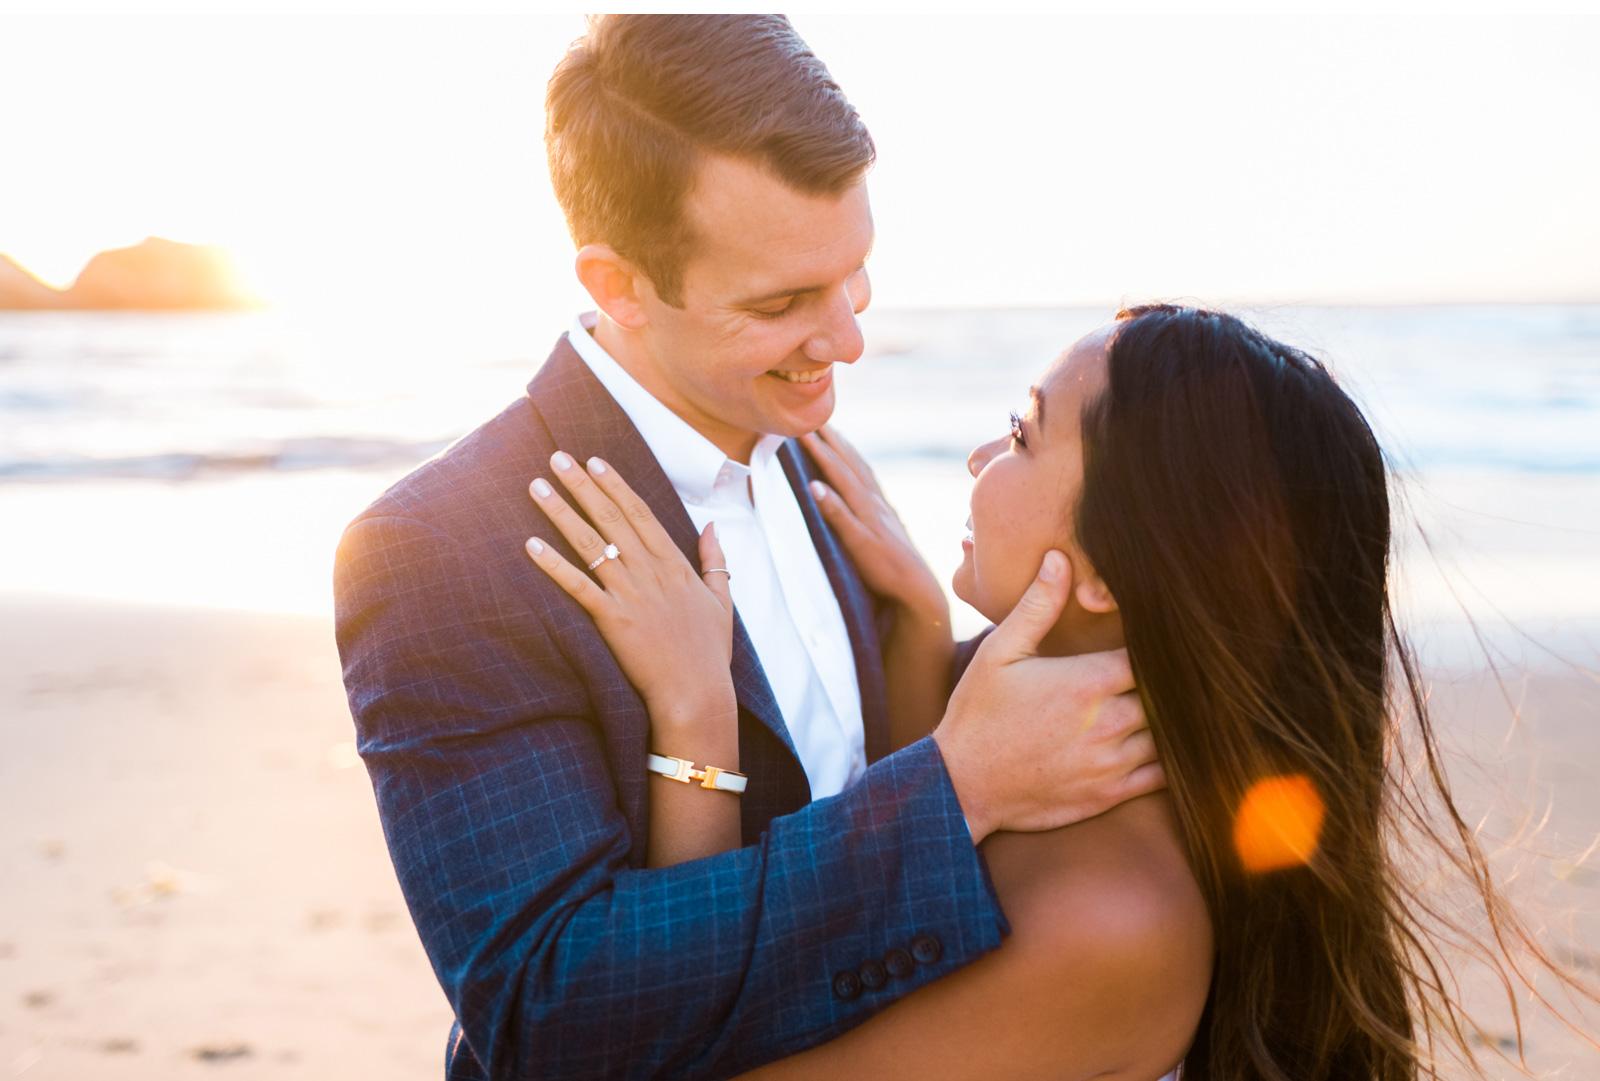 San-Fransisco-Wedding-Natalie-Schutt-Photography-Style-Me-Pretty_04.jpg